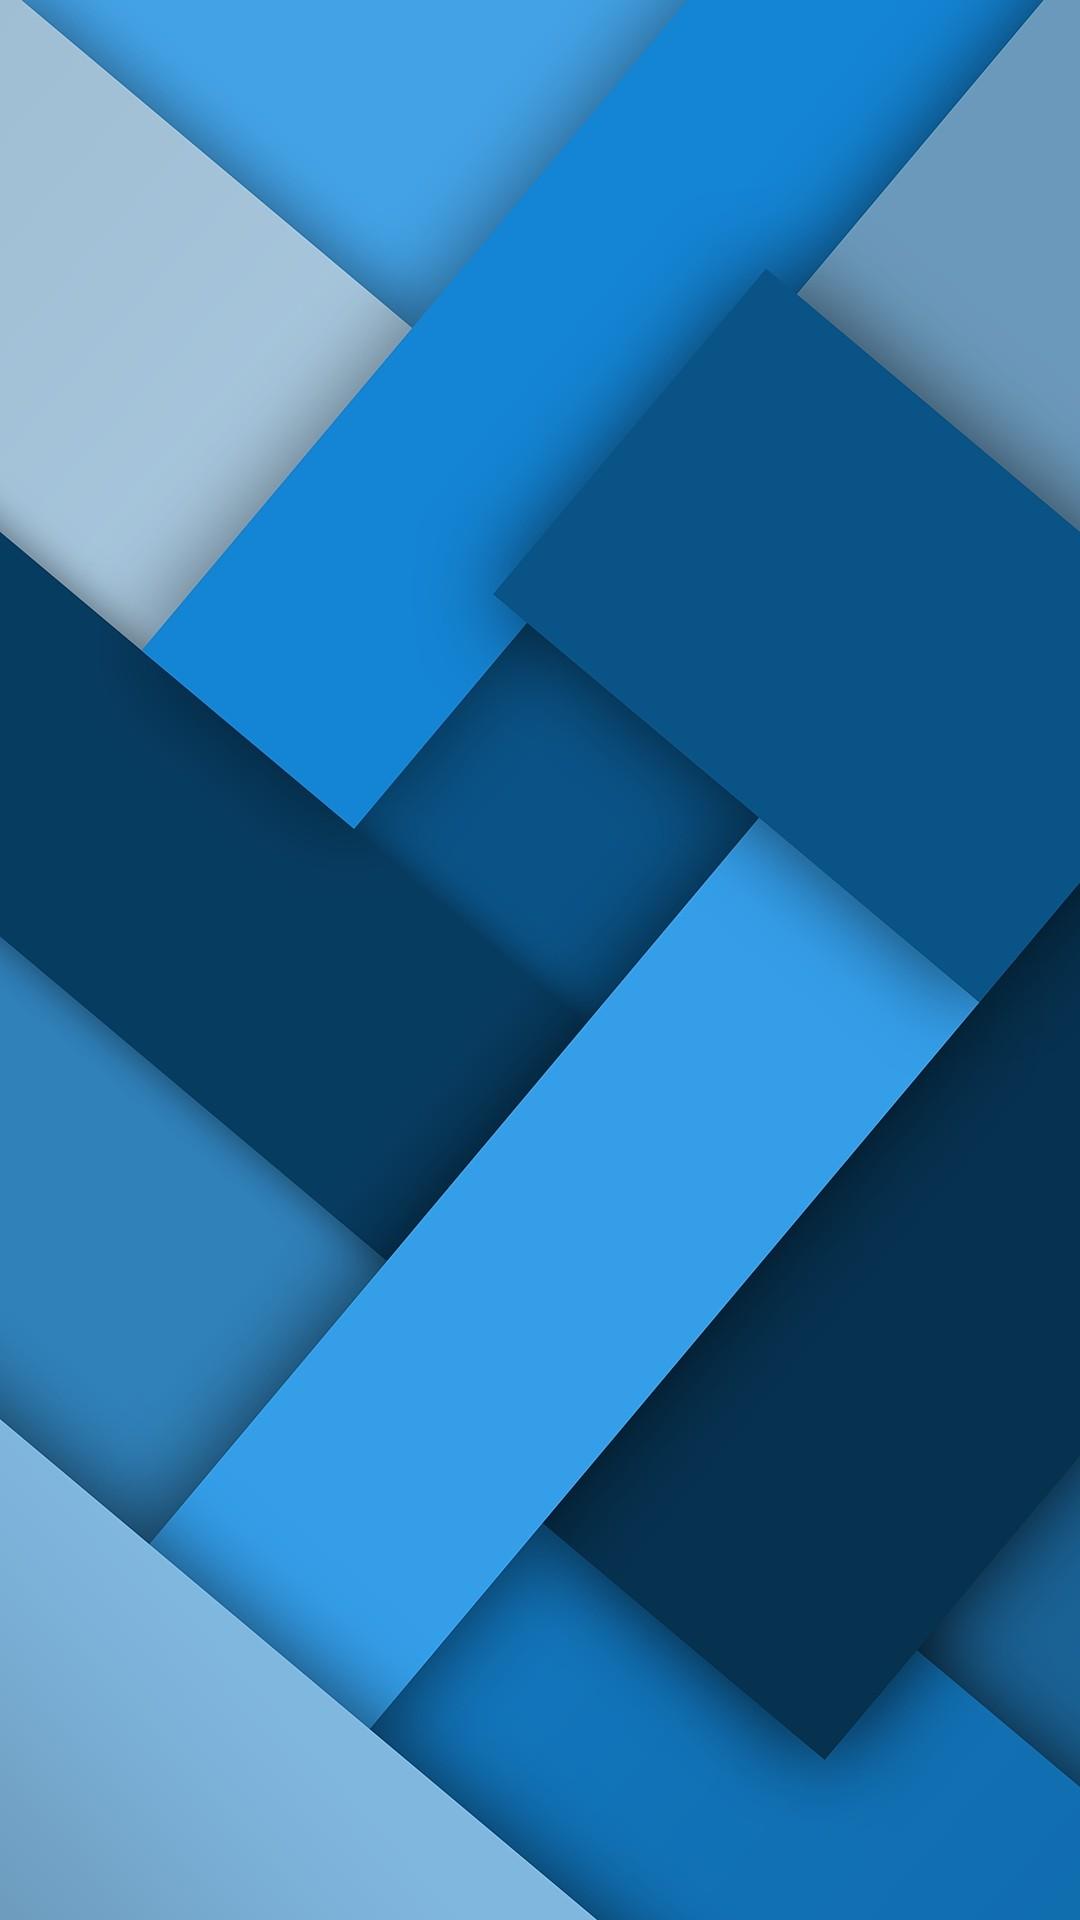 Designer wallpaper for android